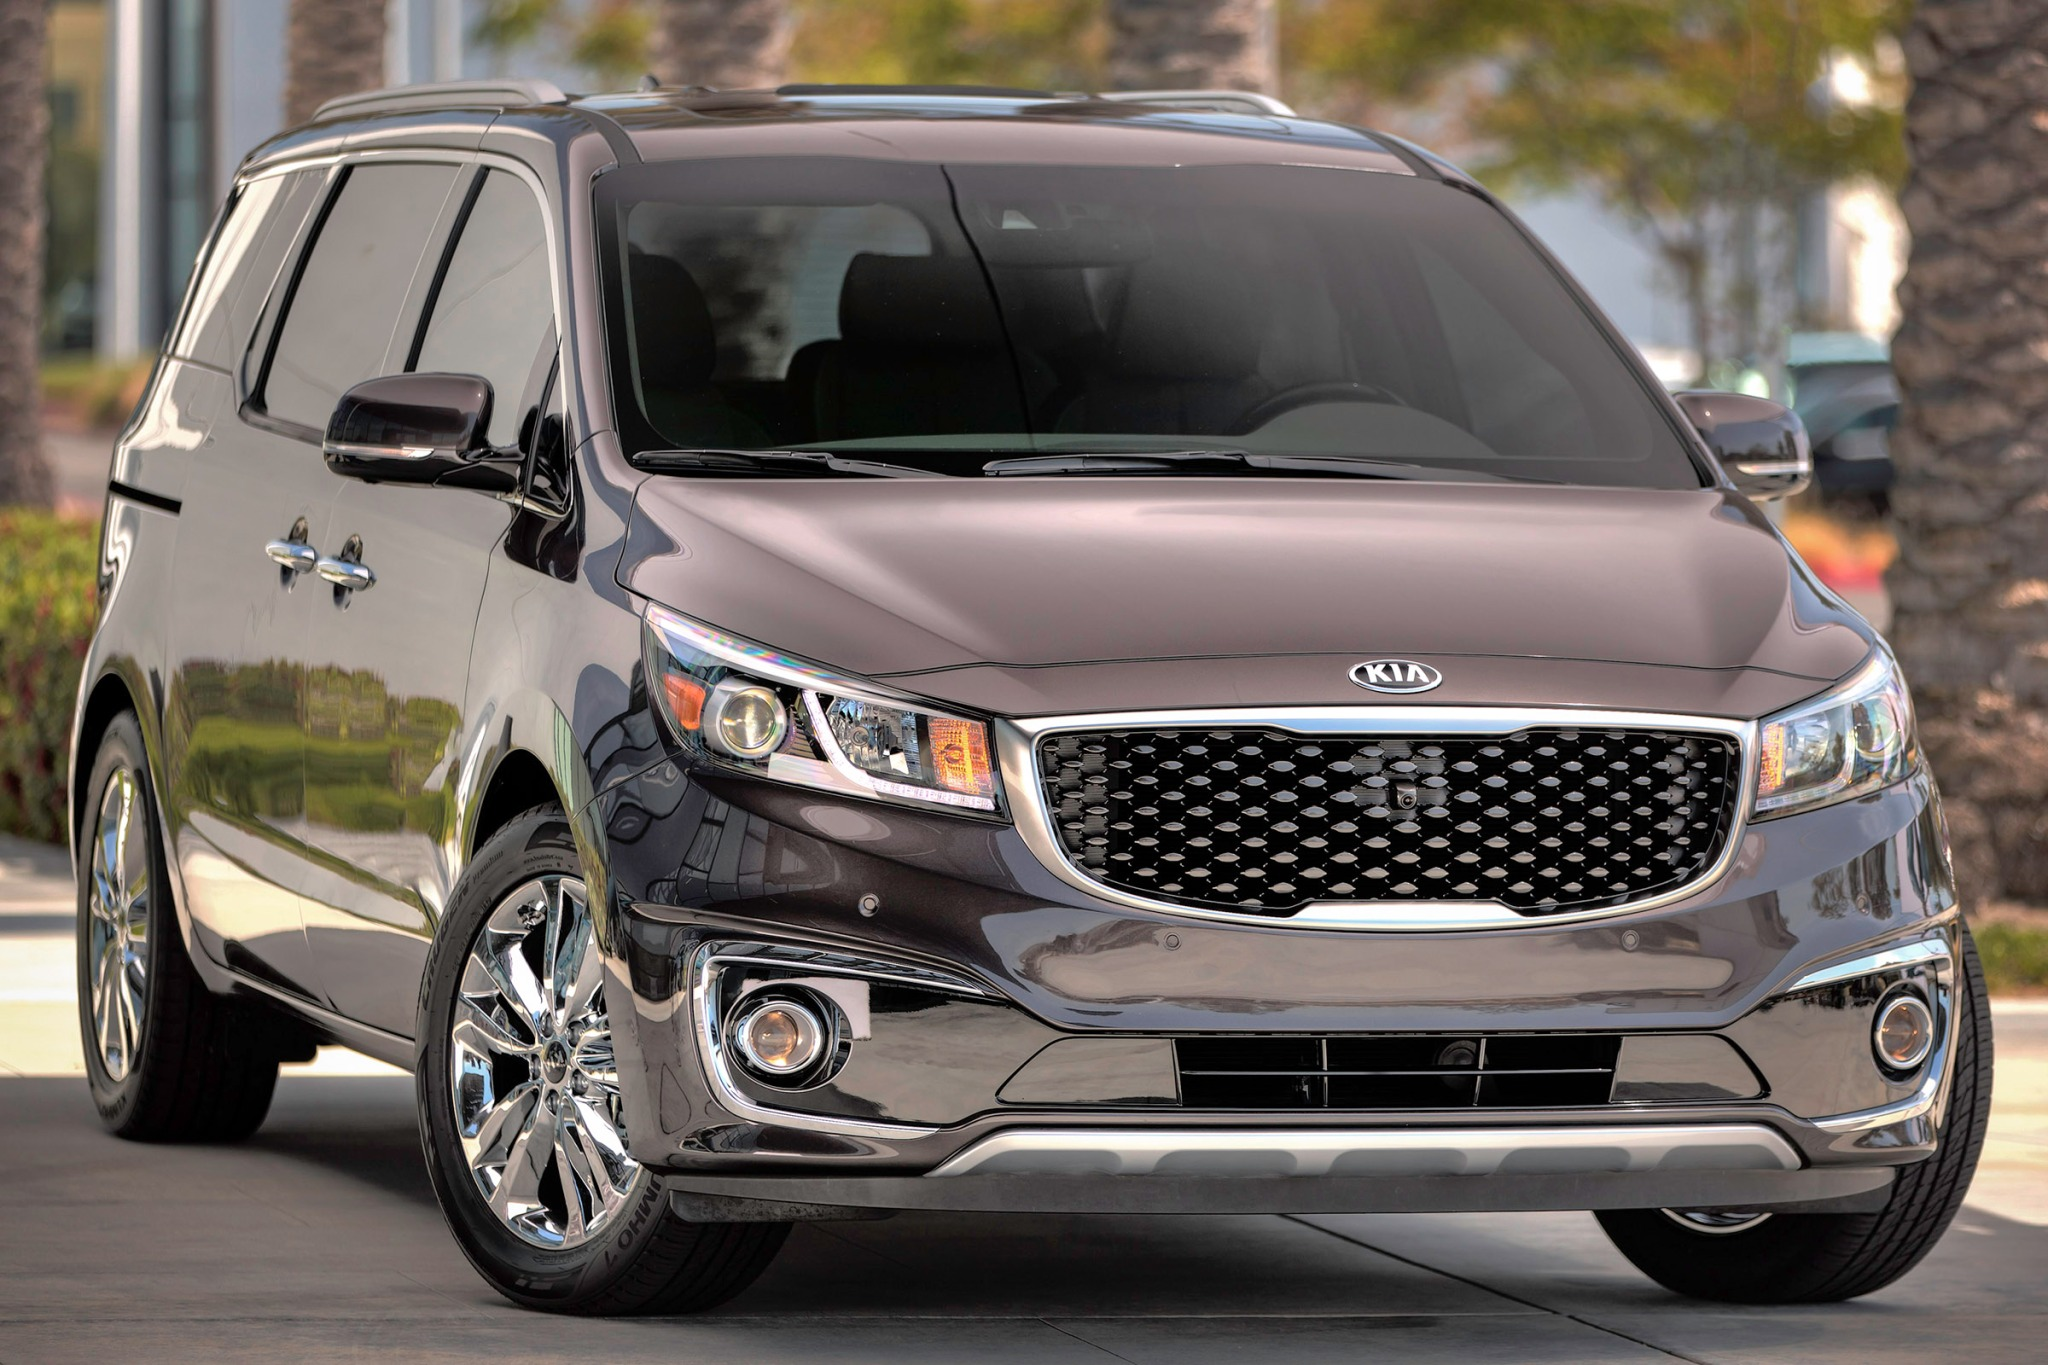 2015 kia sedona passenger minivan limited fq oem 1 2048